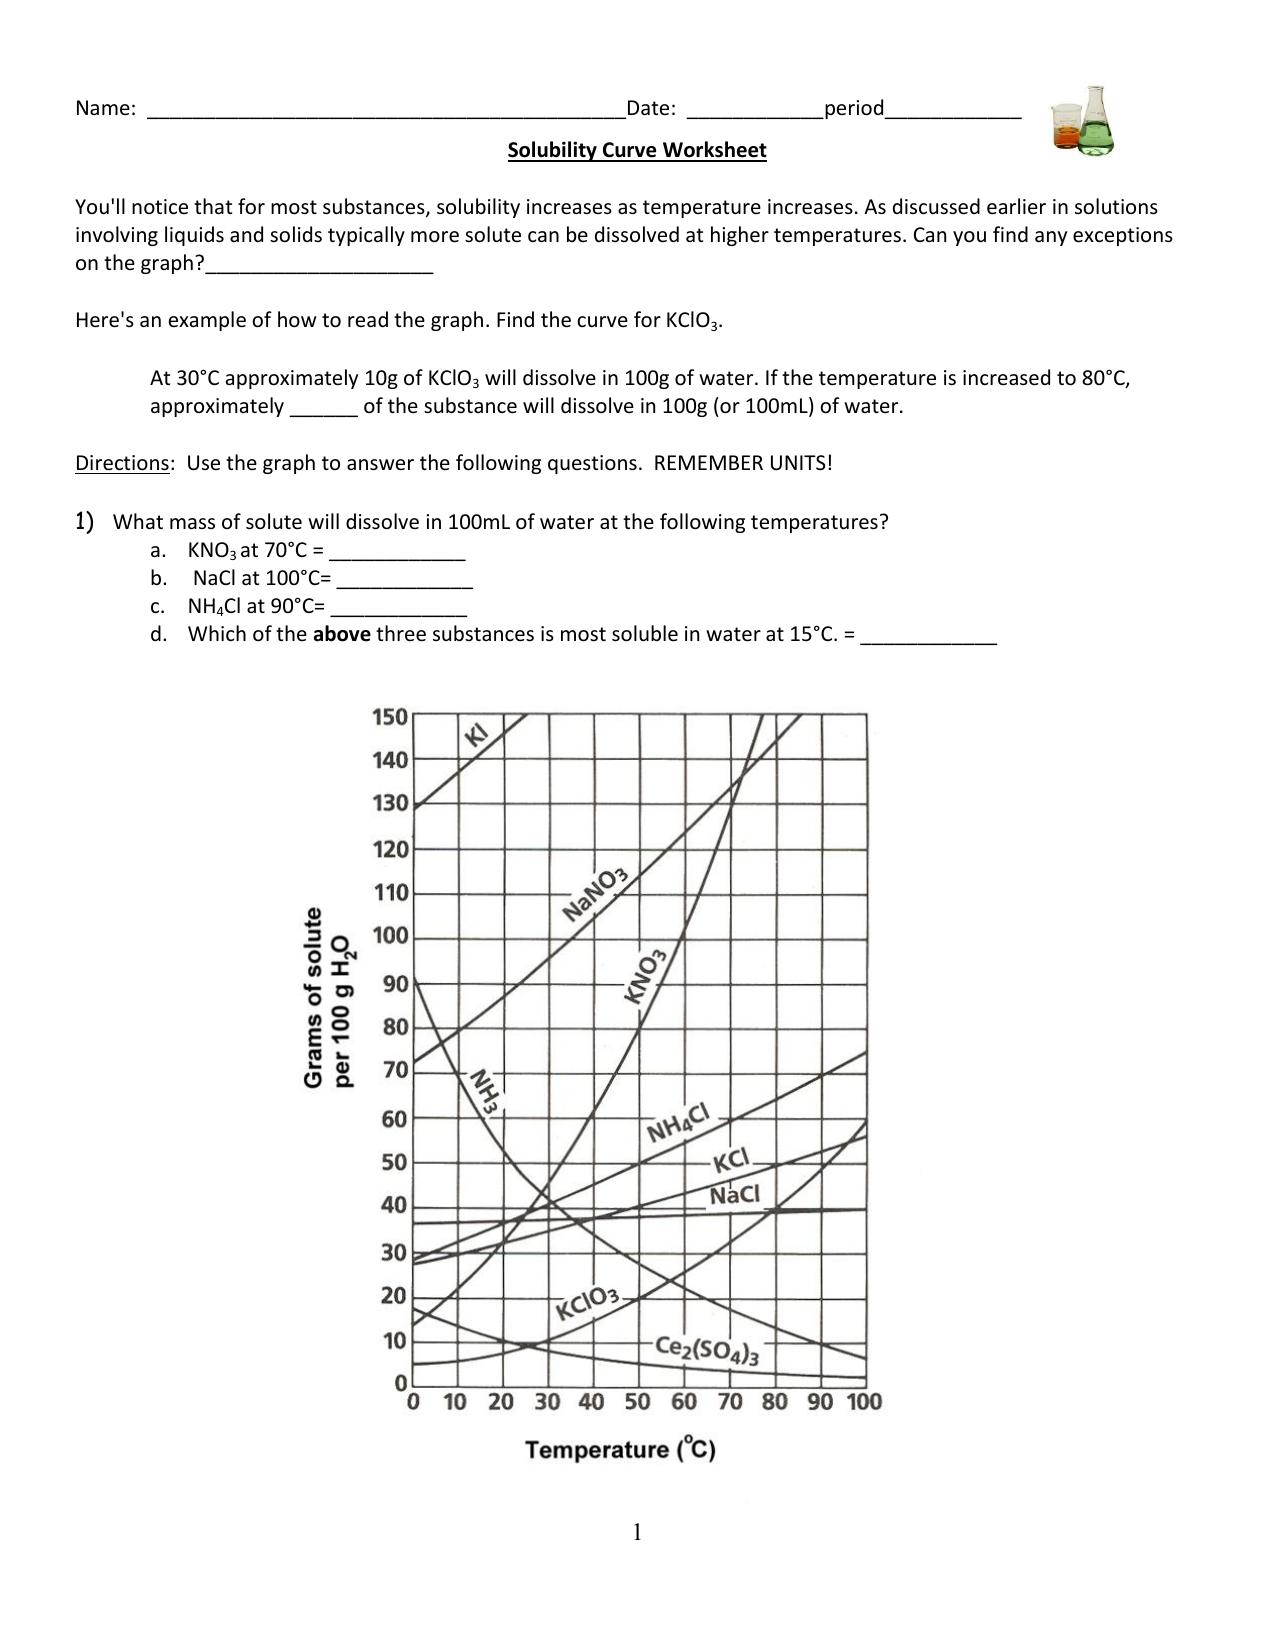 Solubility Curve Worksheet